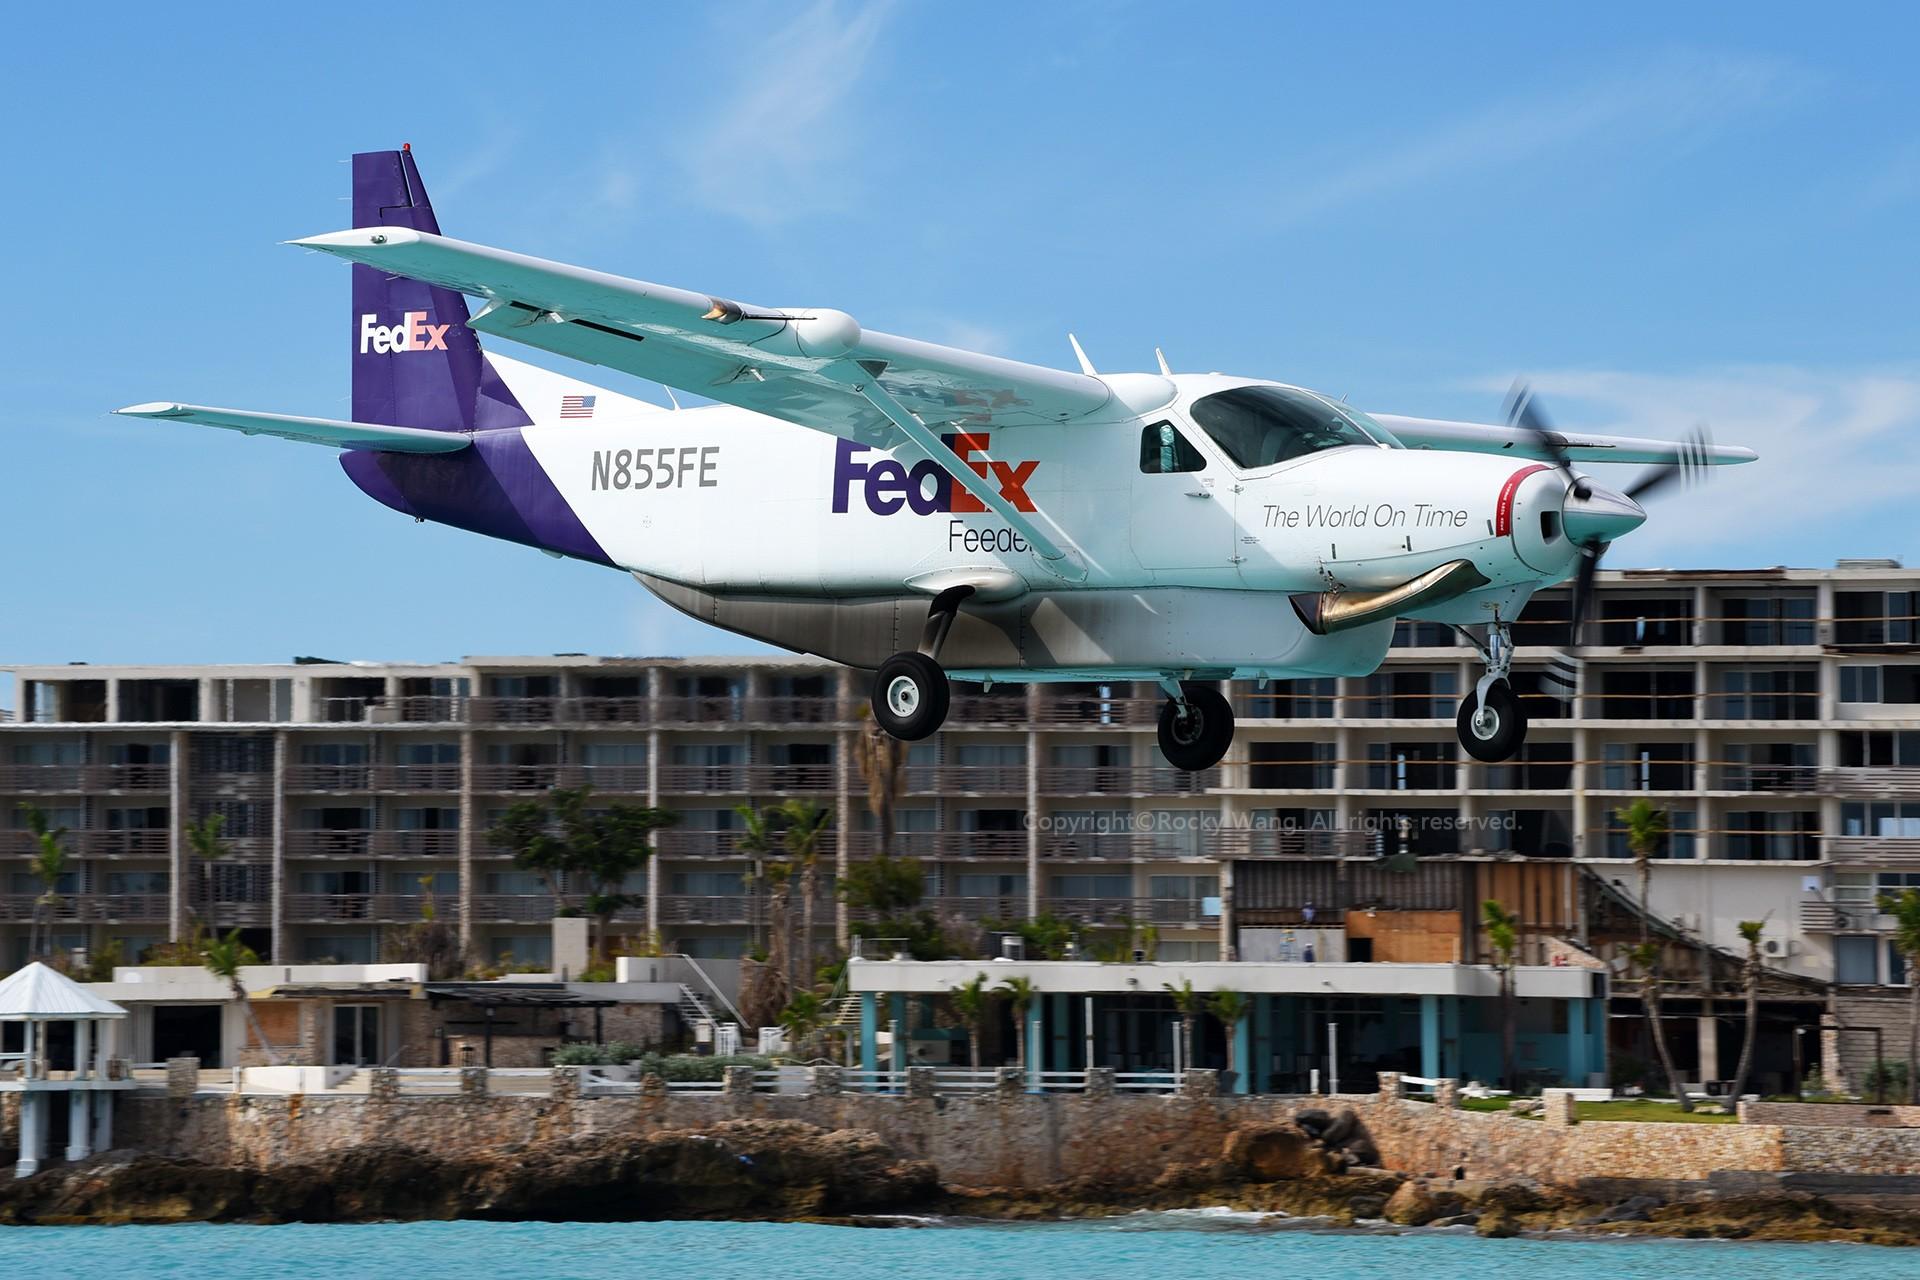 Re:[原创]My endless Caribbean dream——圣马丁朱莉安娜公主机场拍机记 CESSNA 208B SUPER CARGOMASTER N855FE 荷属安的列斯群岛朱利安娜公主机场